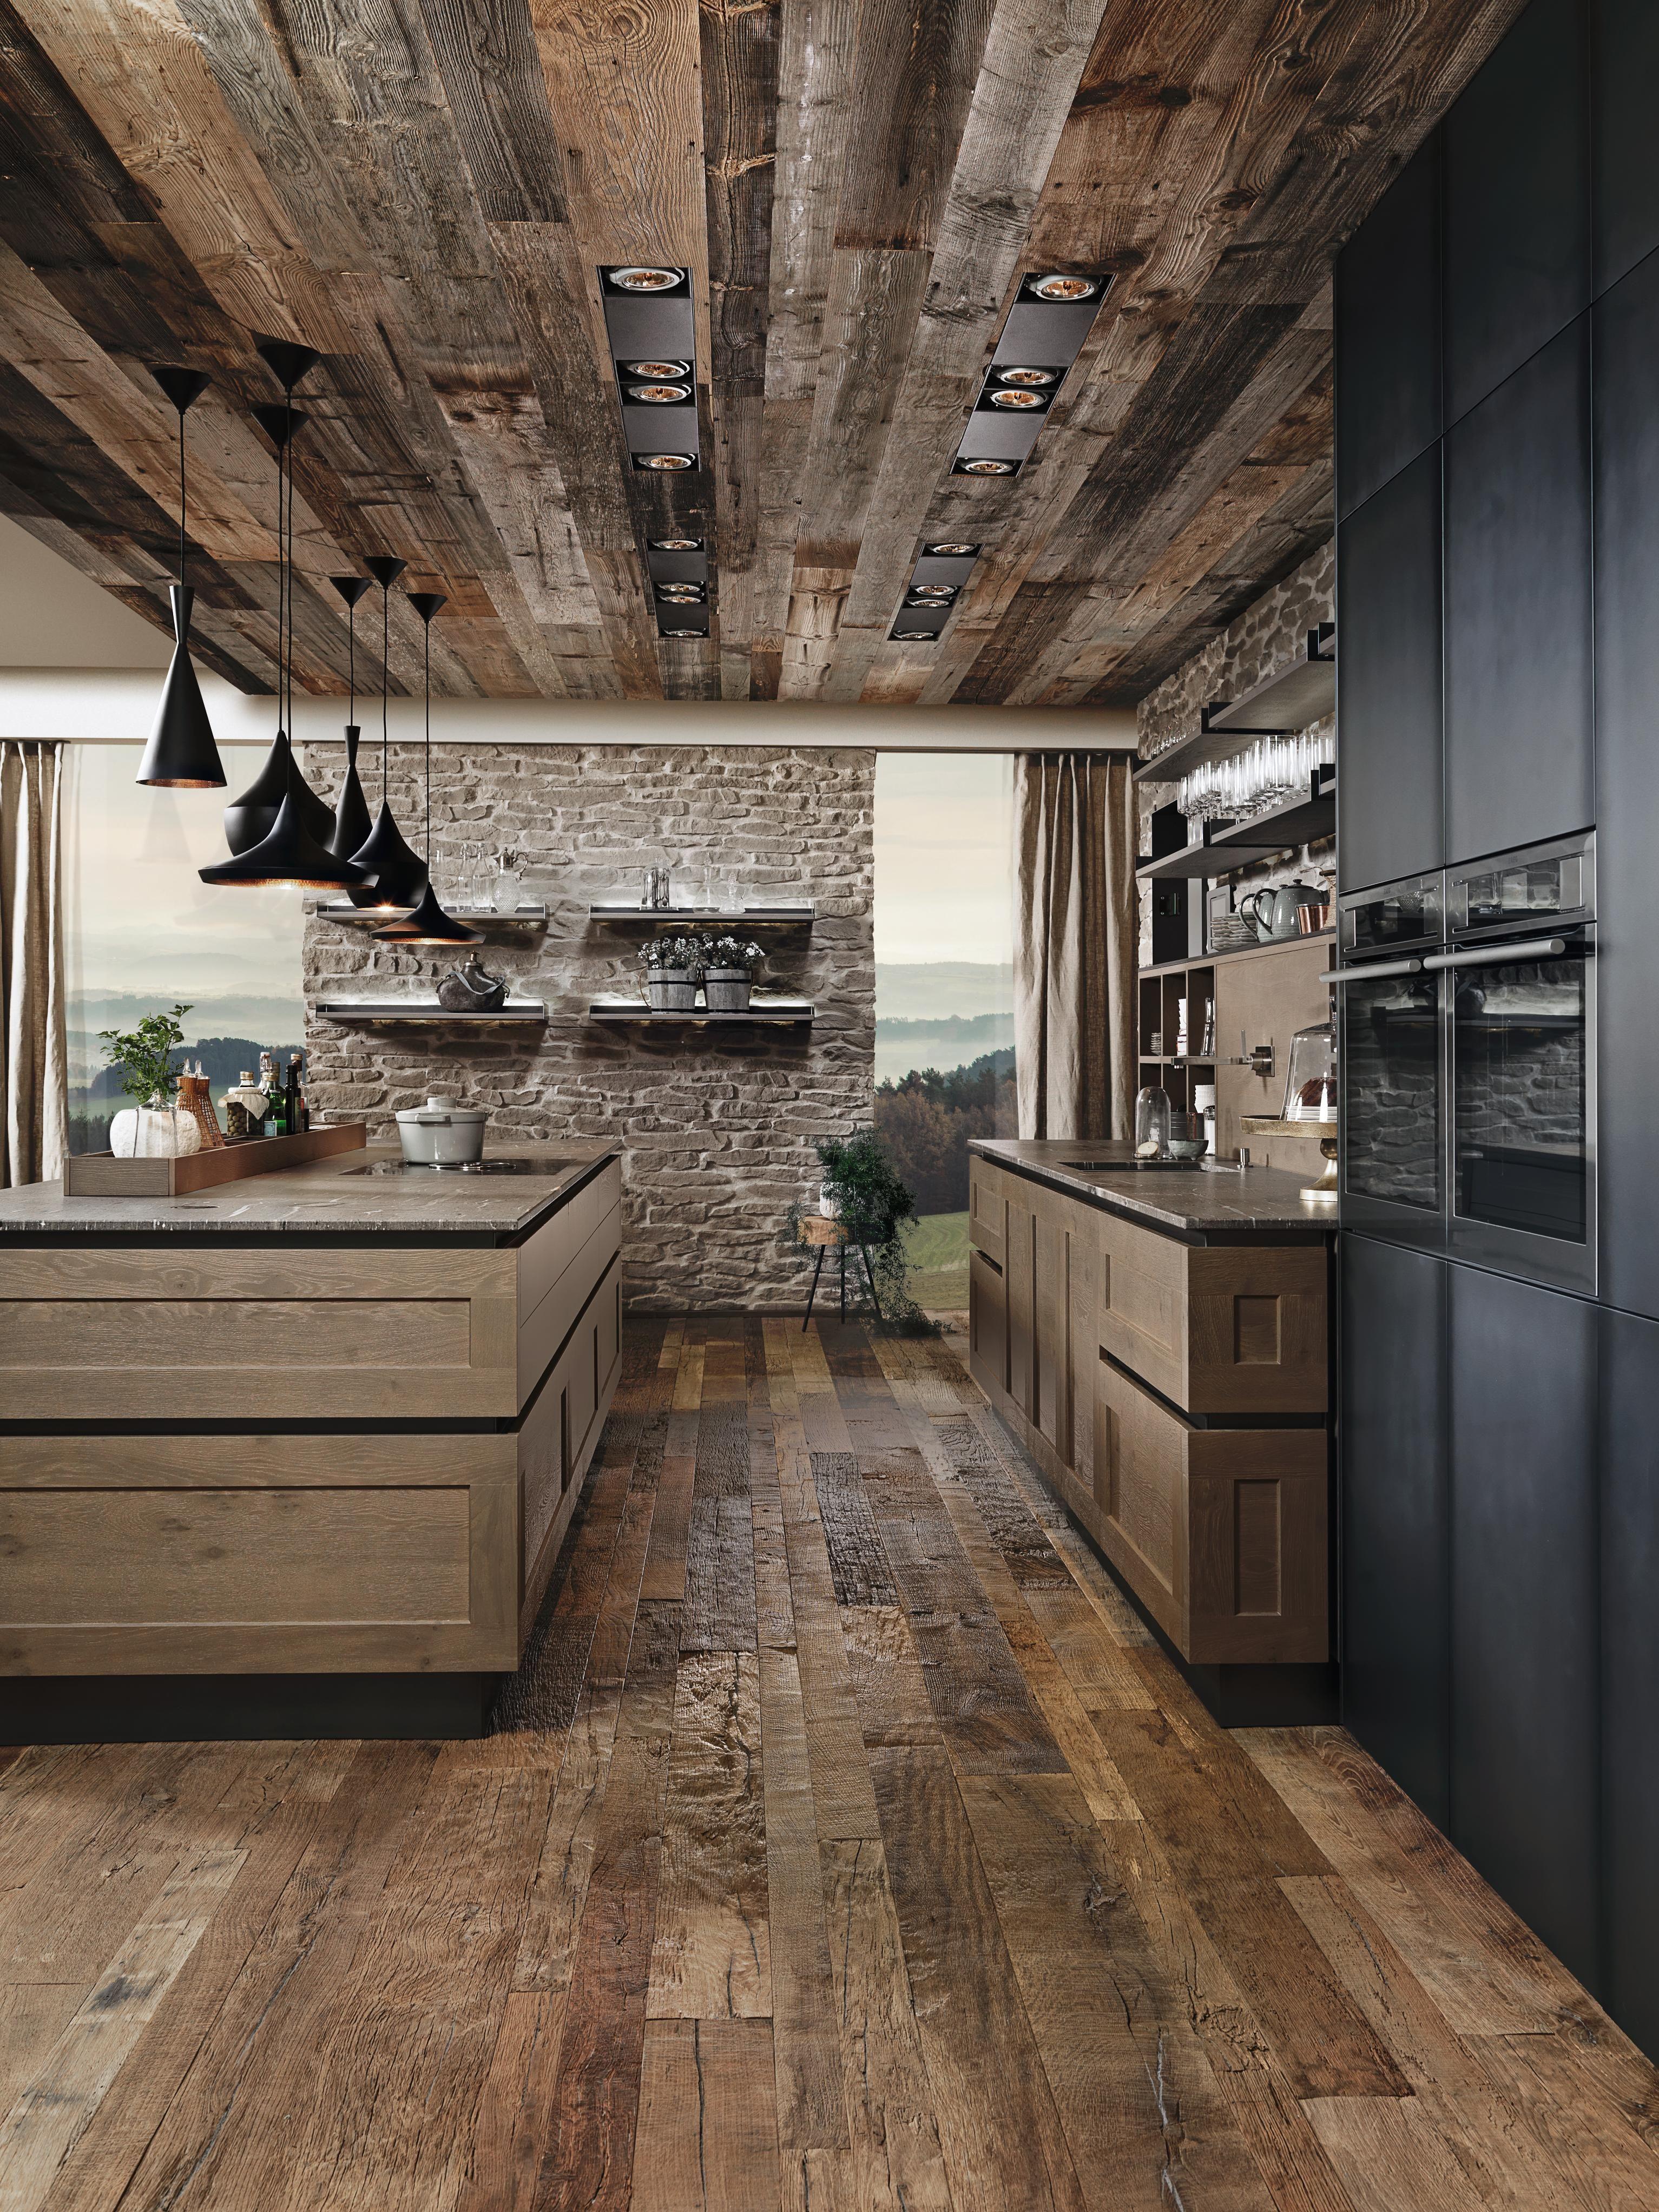 Beste Kuchenmarke Leder Sitzbank Global 3190 In Blau Krause Home